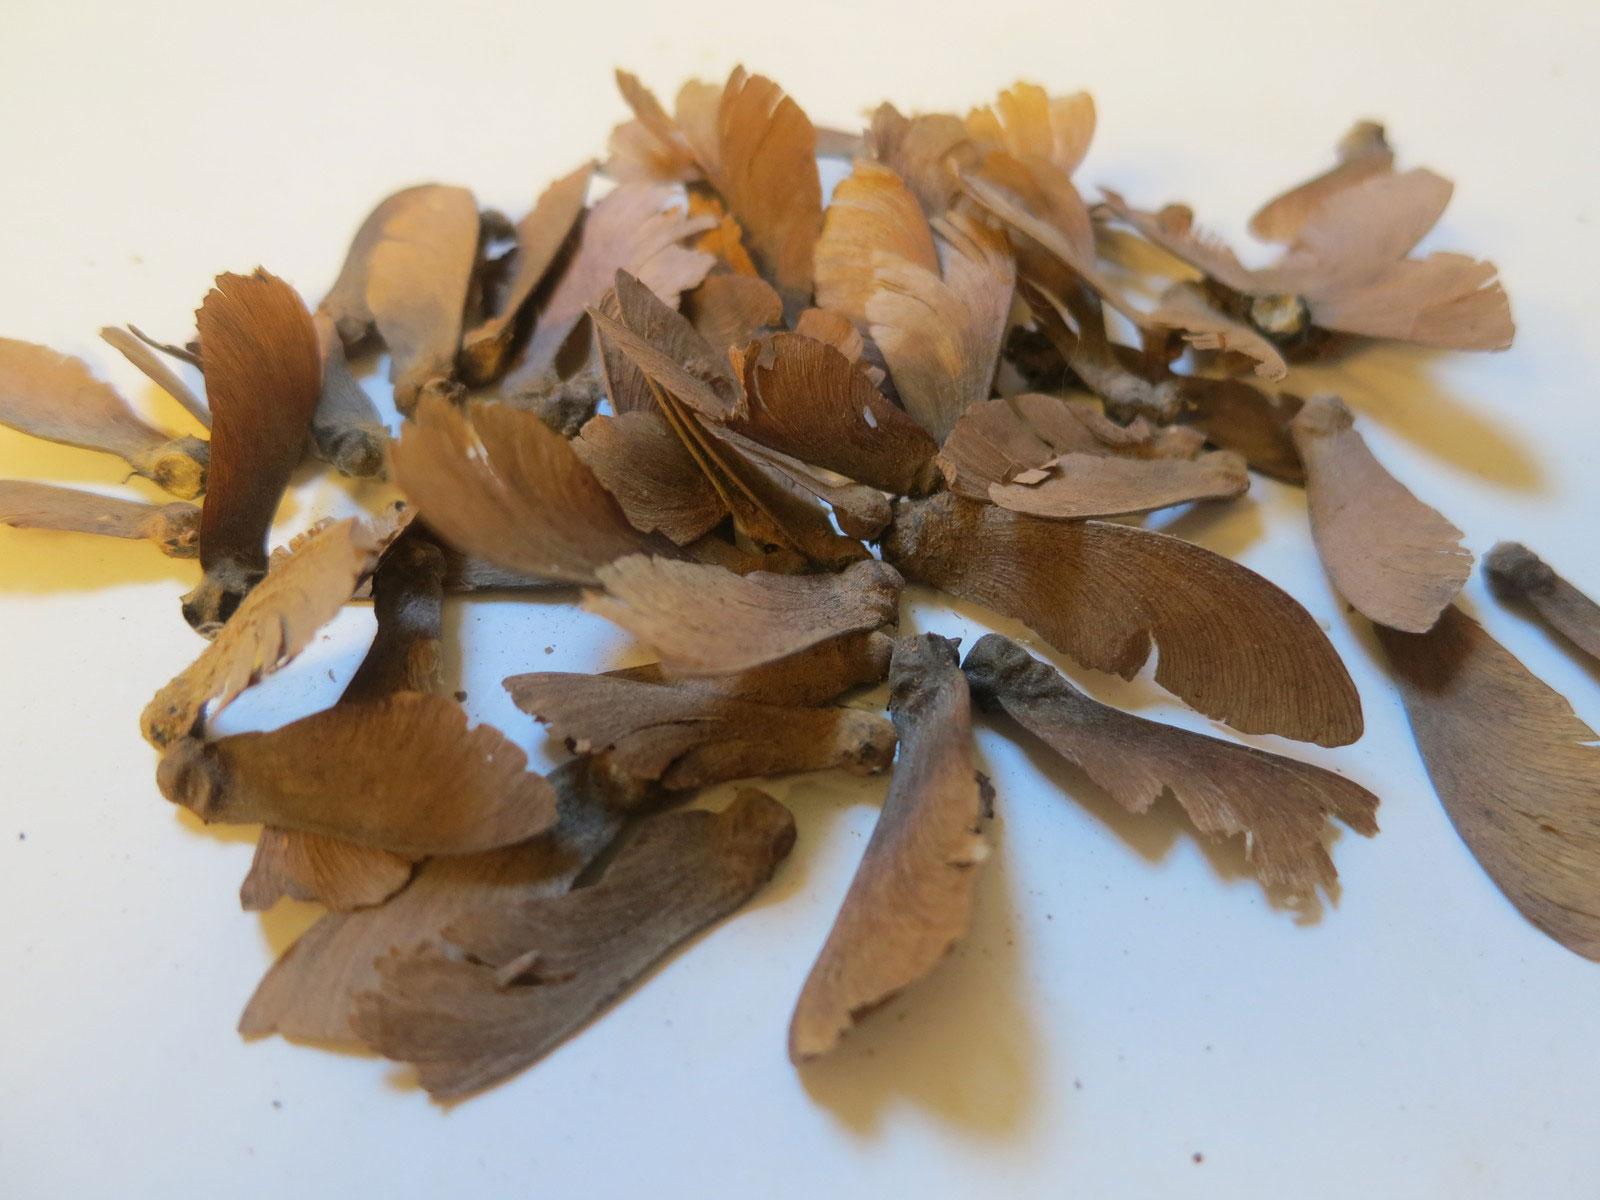 Seeds-of-Ayahuasca